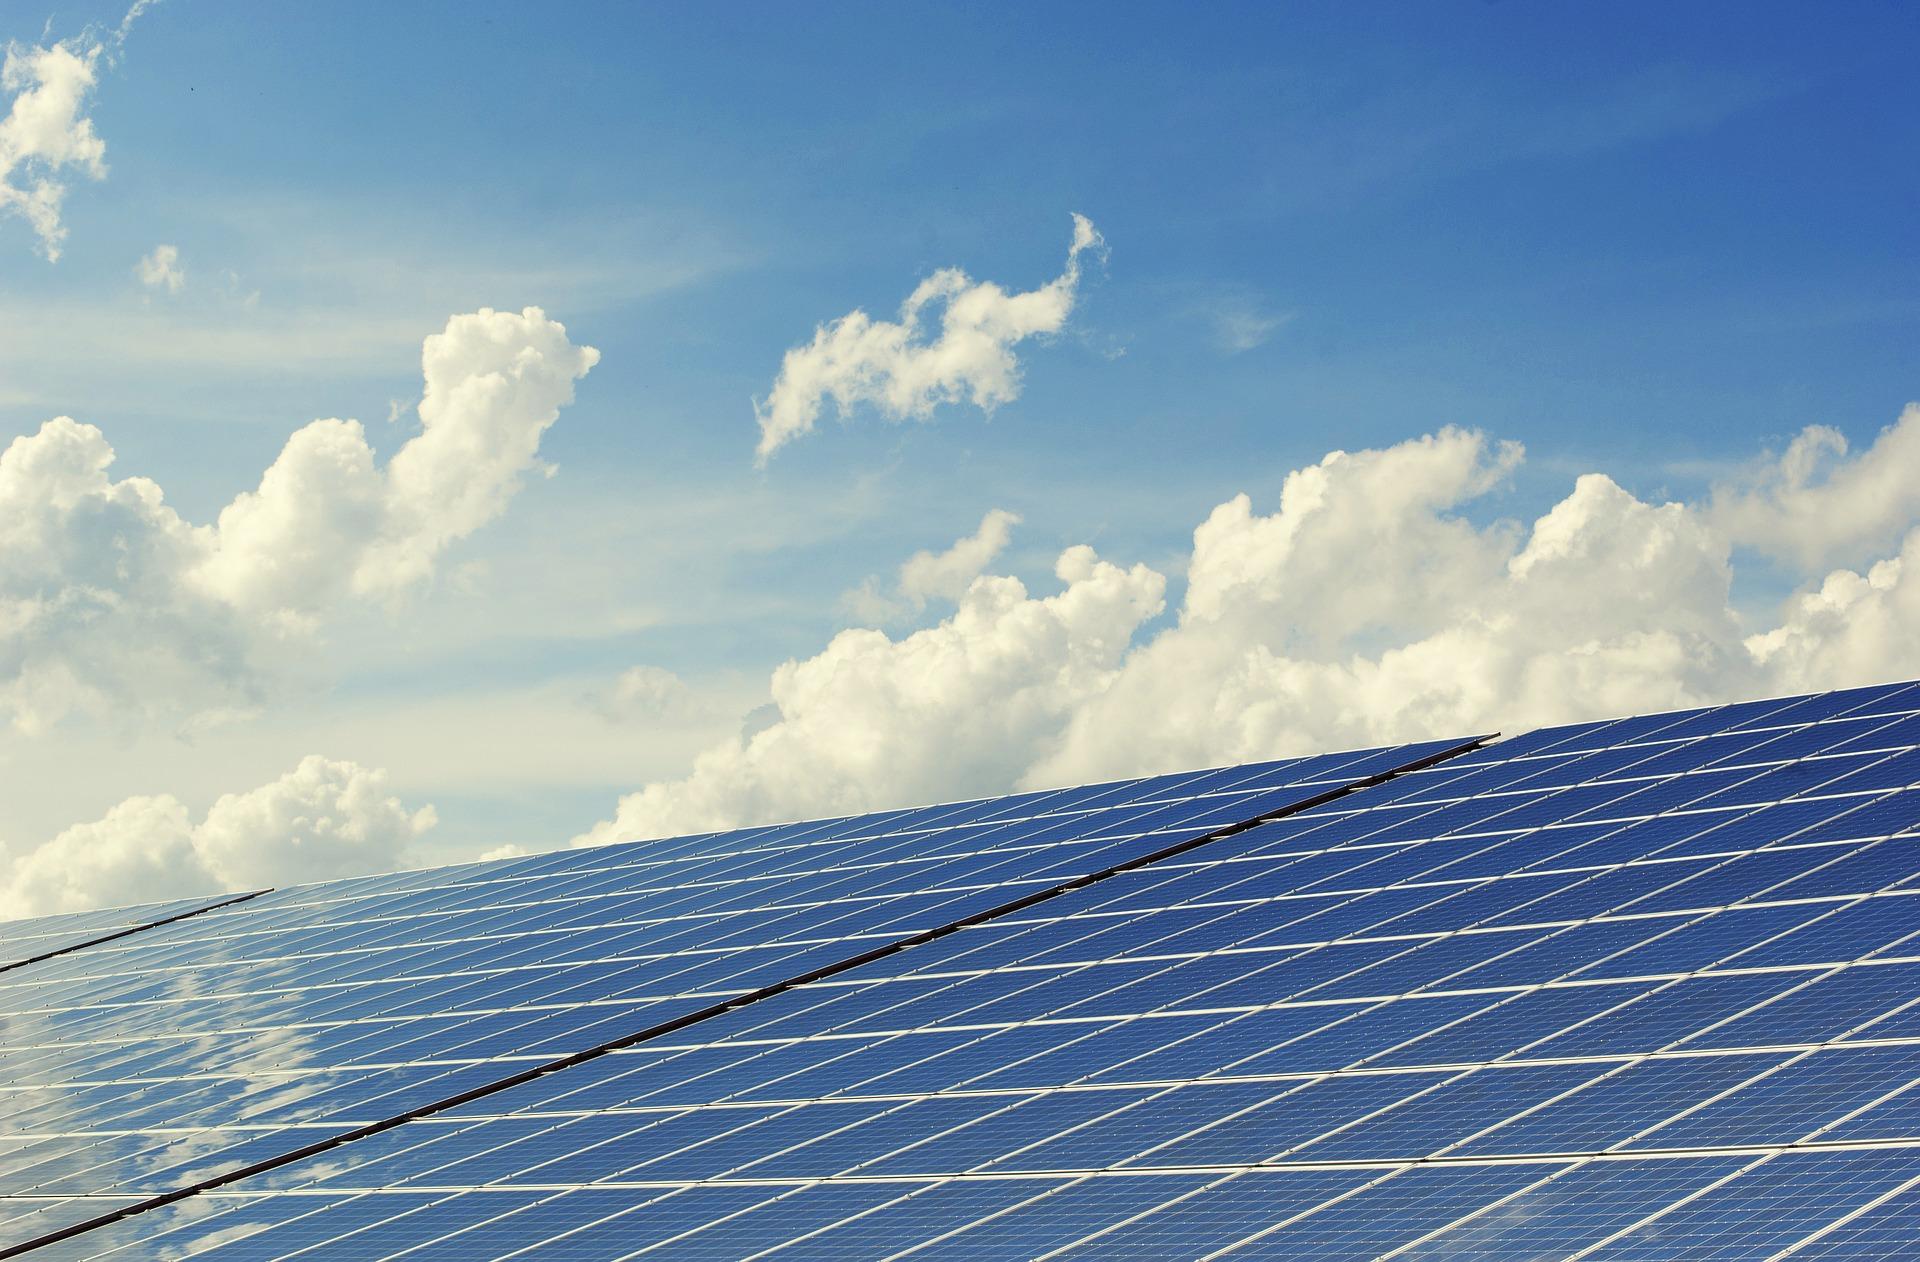 photovoltaic-2138992_1920.jpg